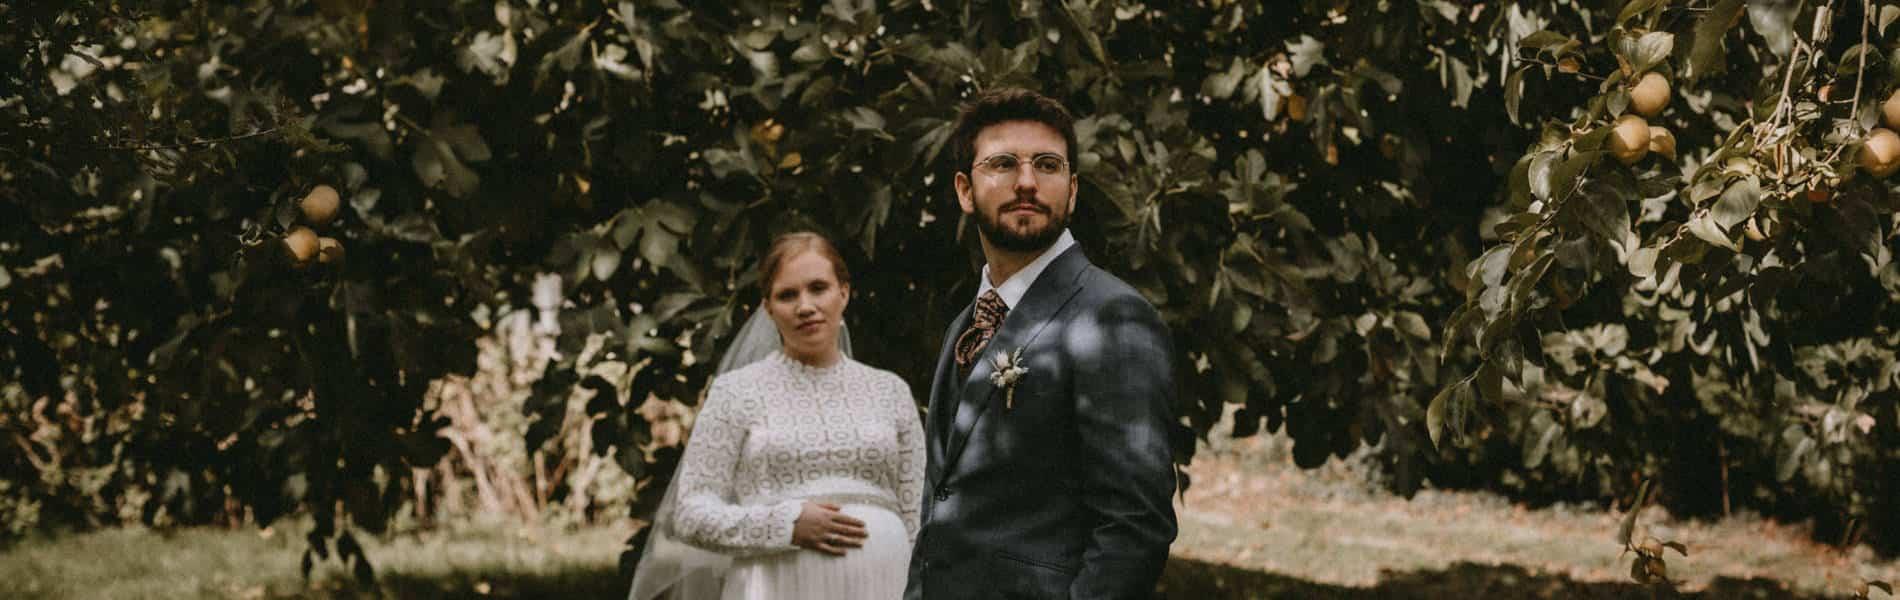 photographe de mariage Bergerac